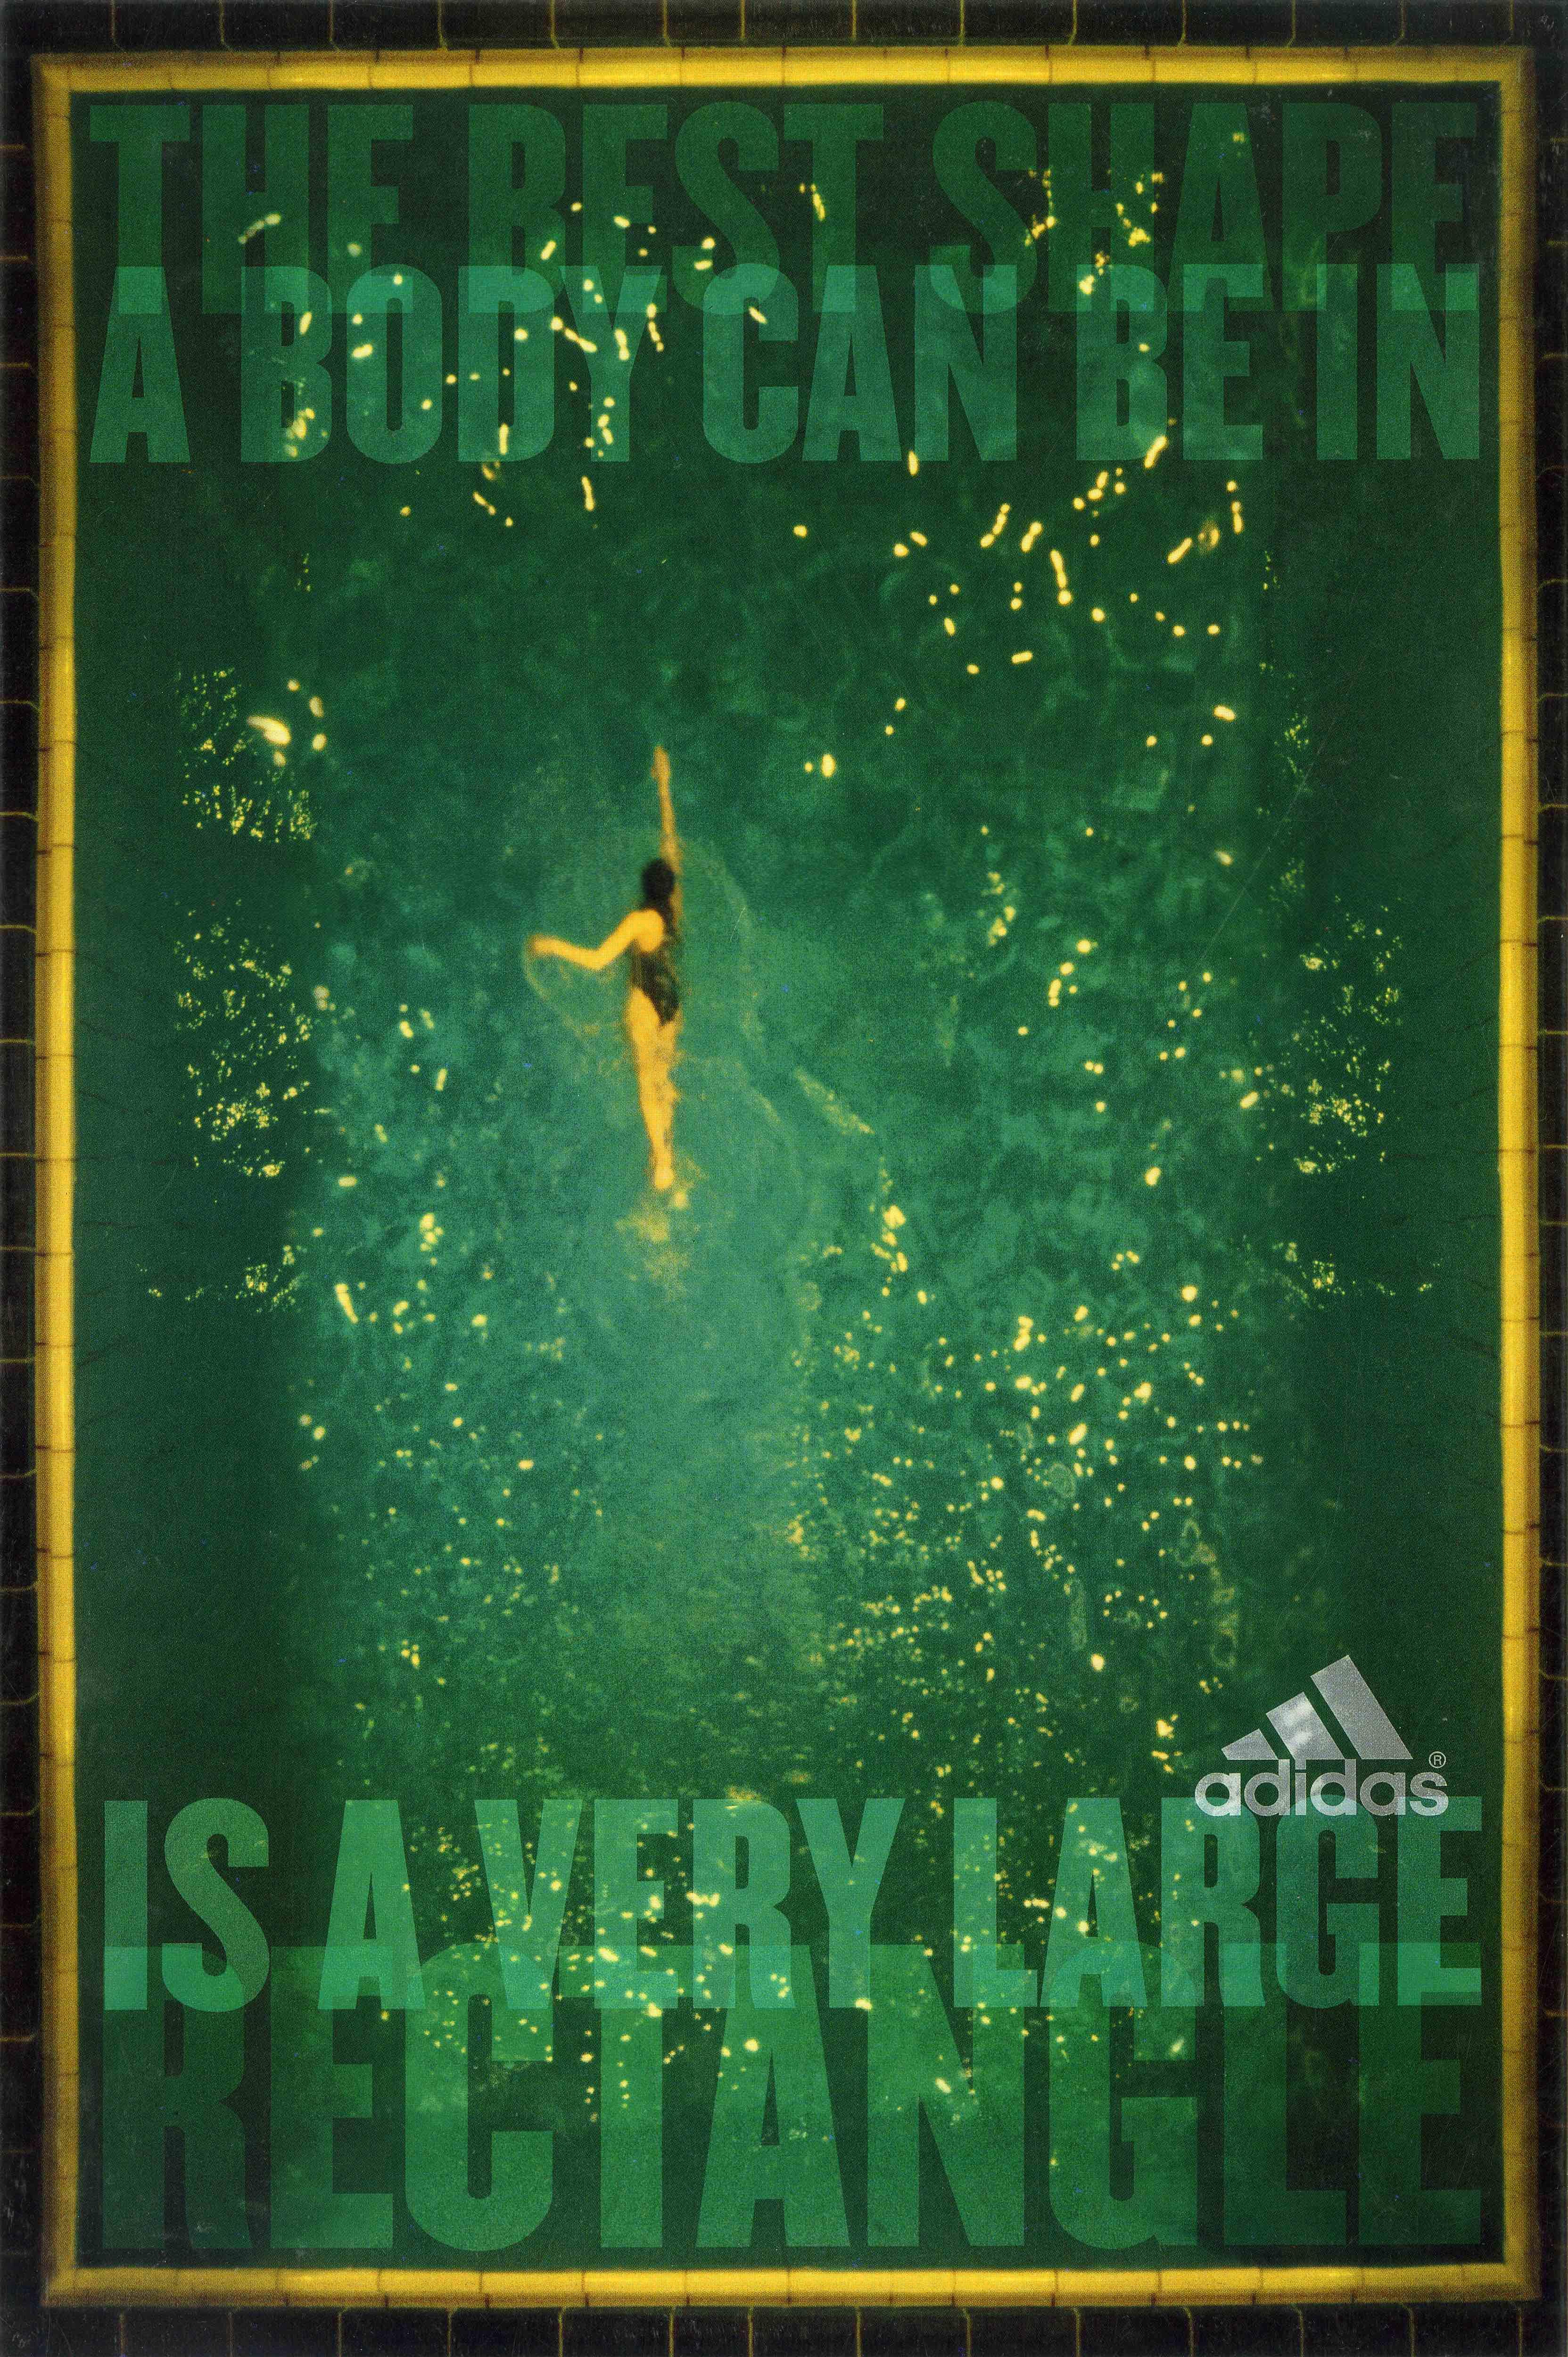 adidas-swimming-large-rectangle